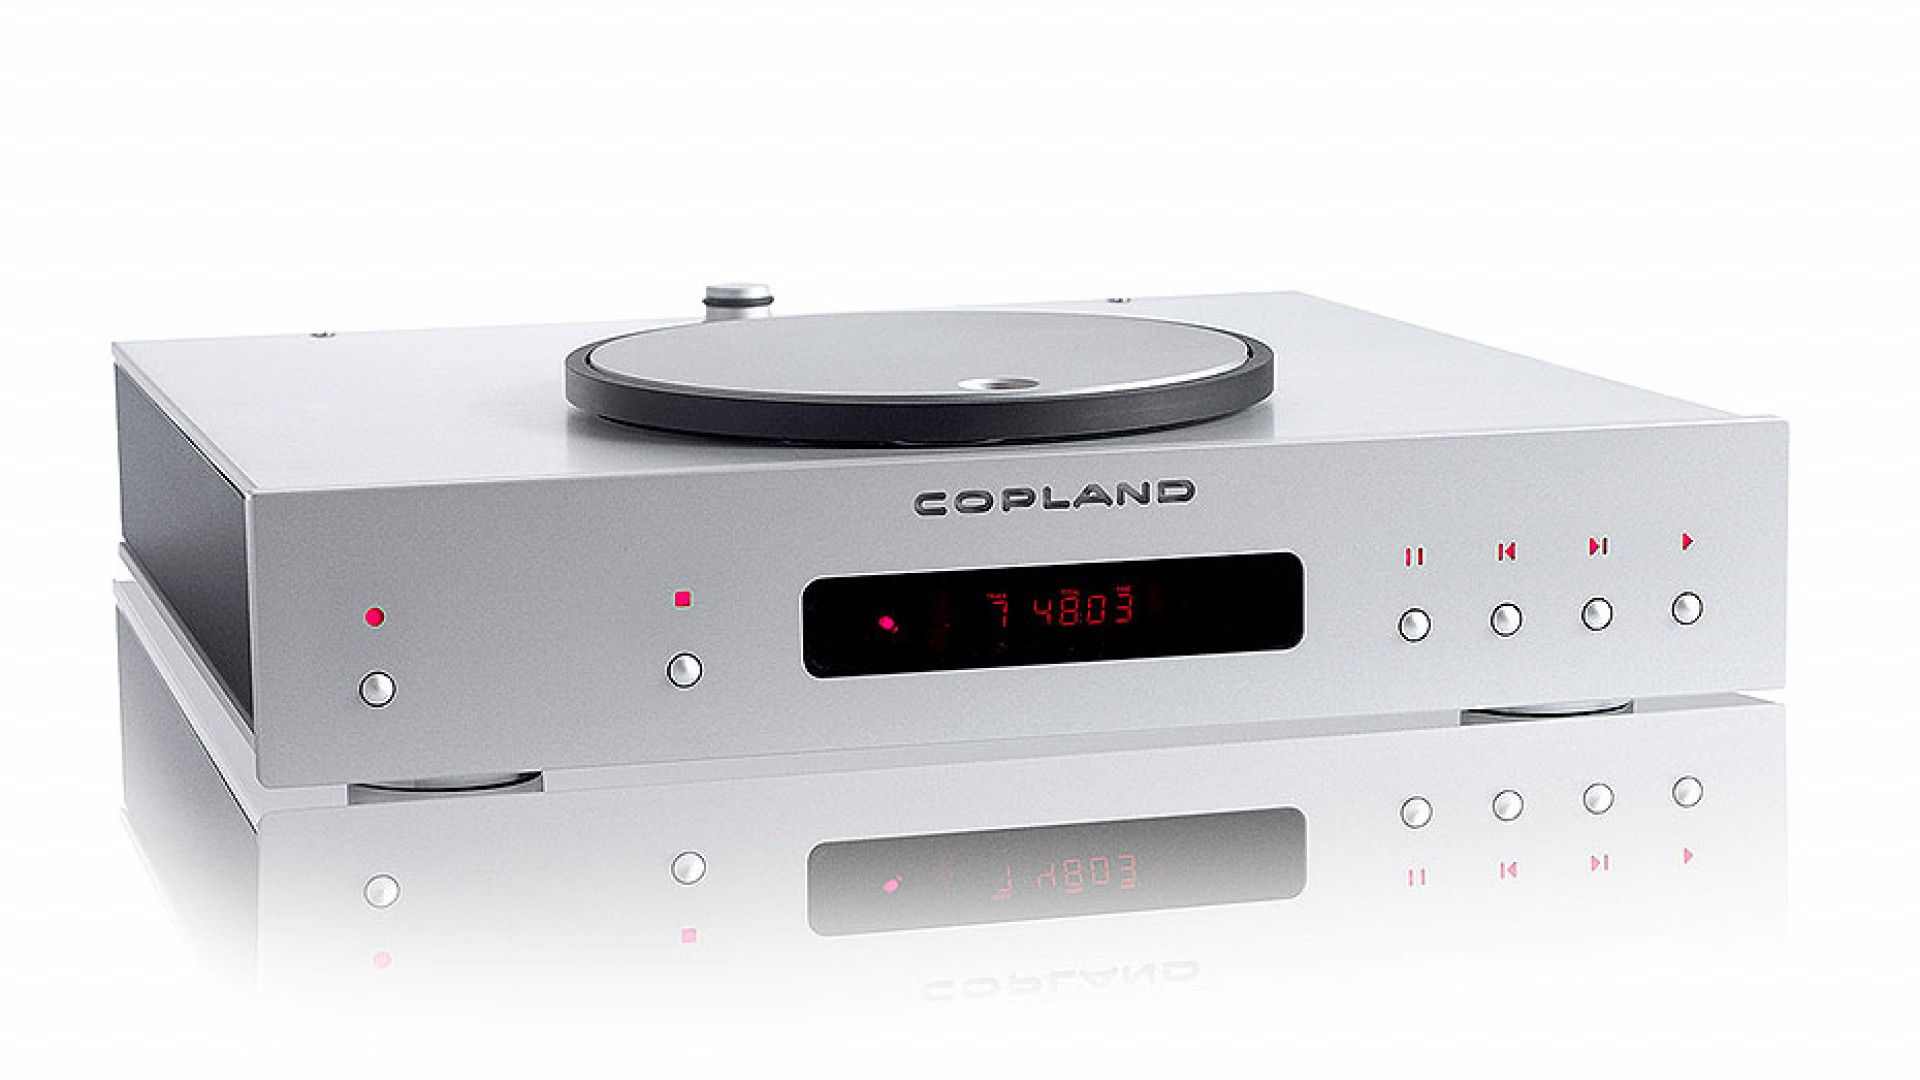 Copland CDA 825, £4,298